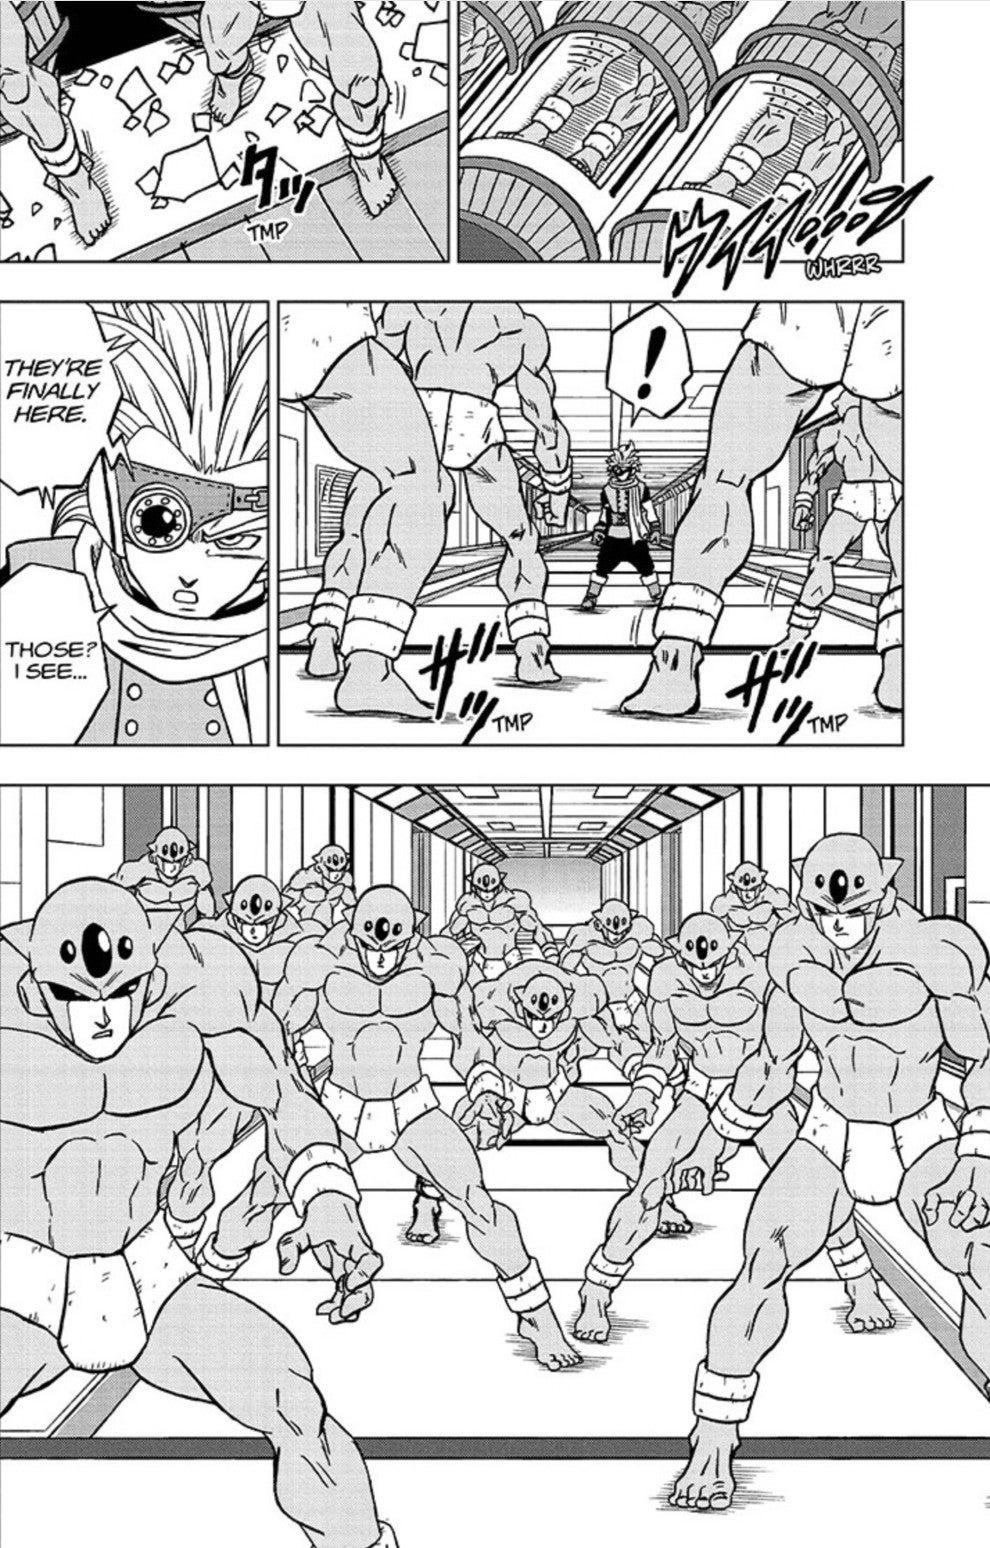 Dragon Ball Super Manga 67 Spoilers Granola vs Androids 73